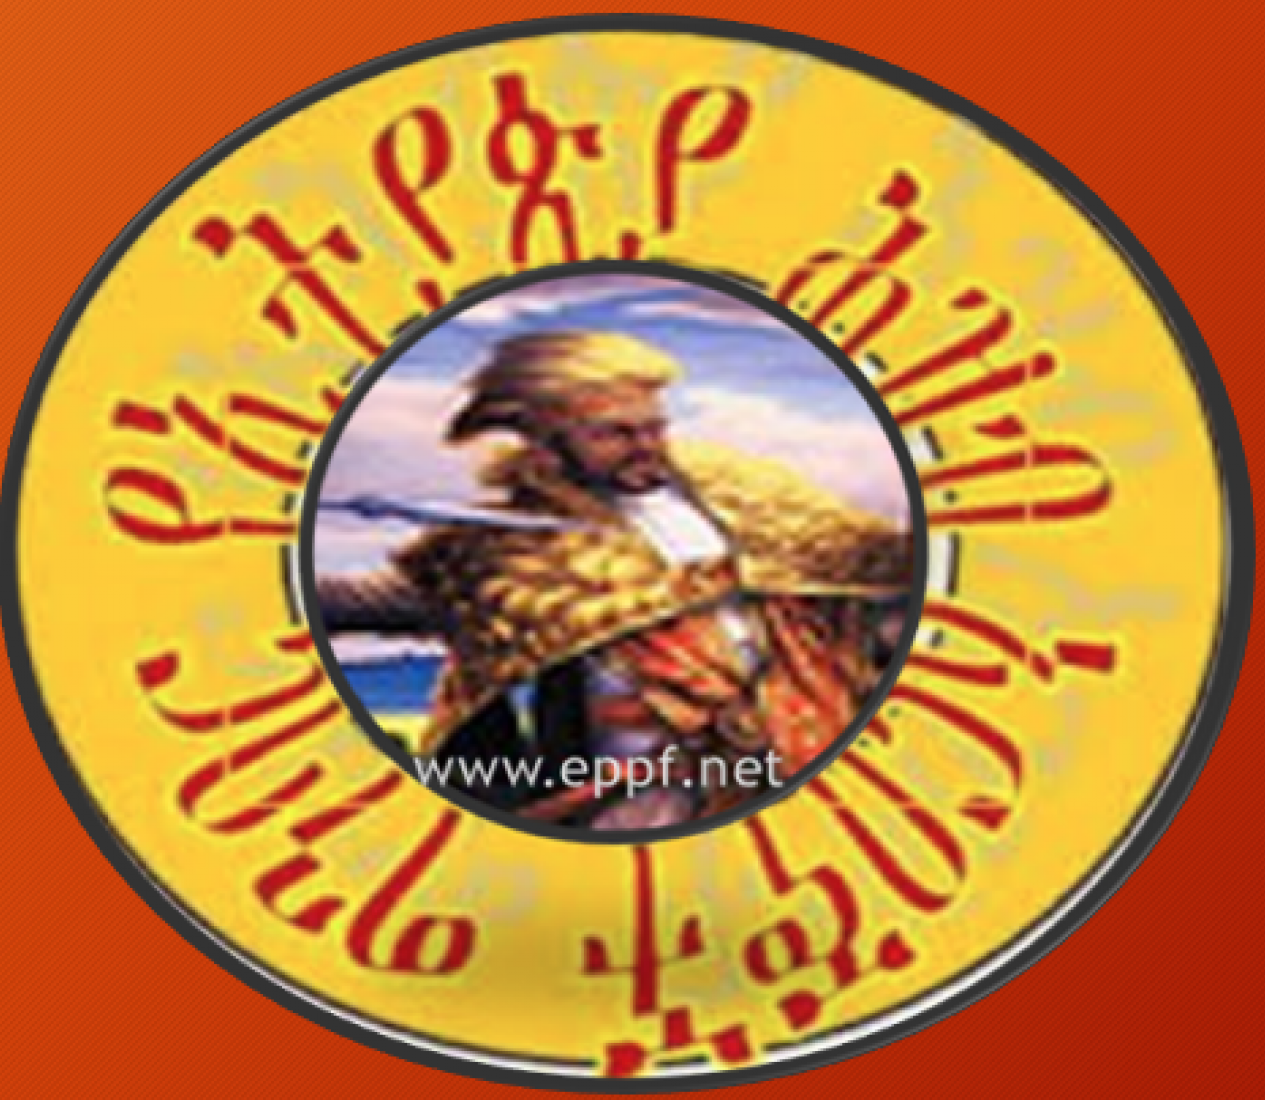 Ethiopian People's Patriotic Front                     የኢትዮጵያ ሕዝብ አርበኞች ግንባር